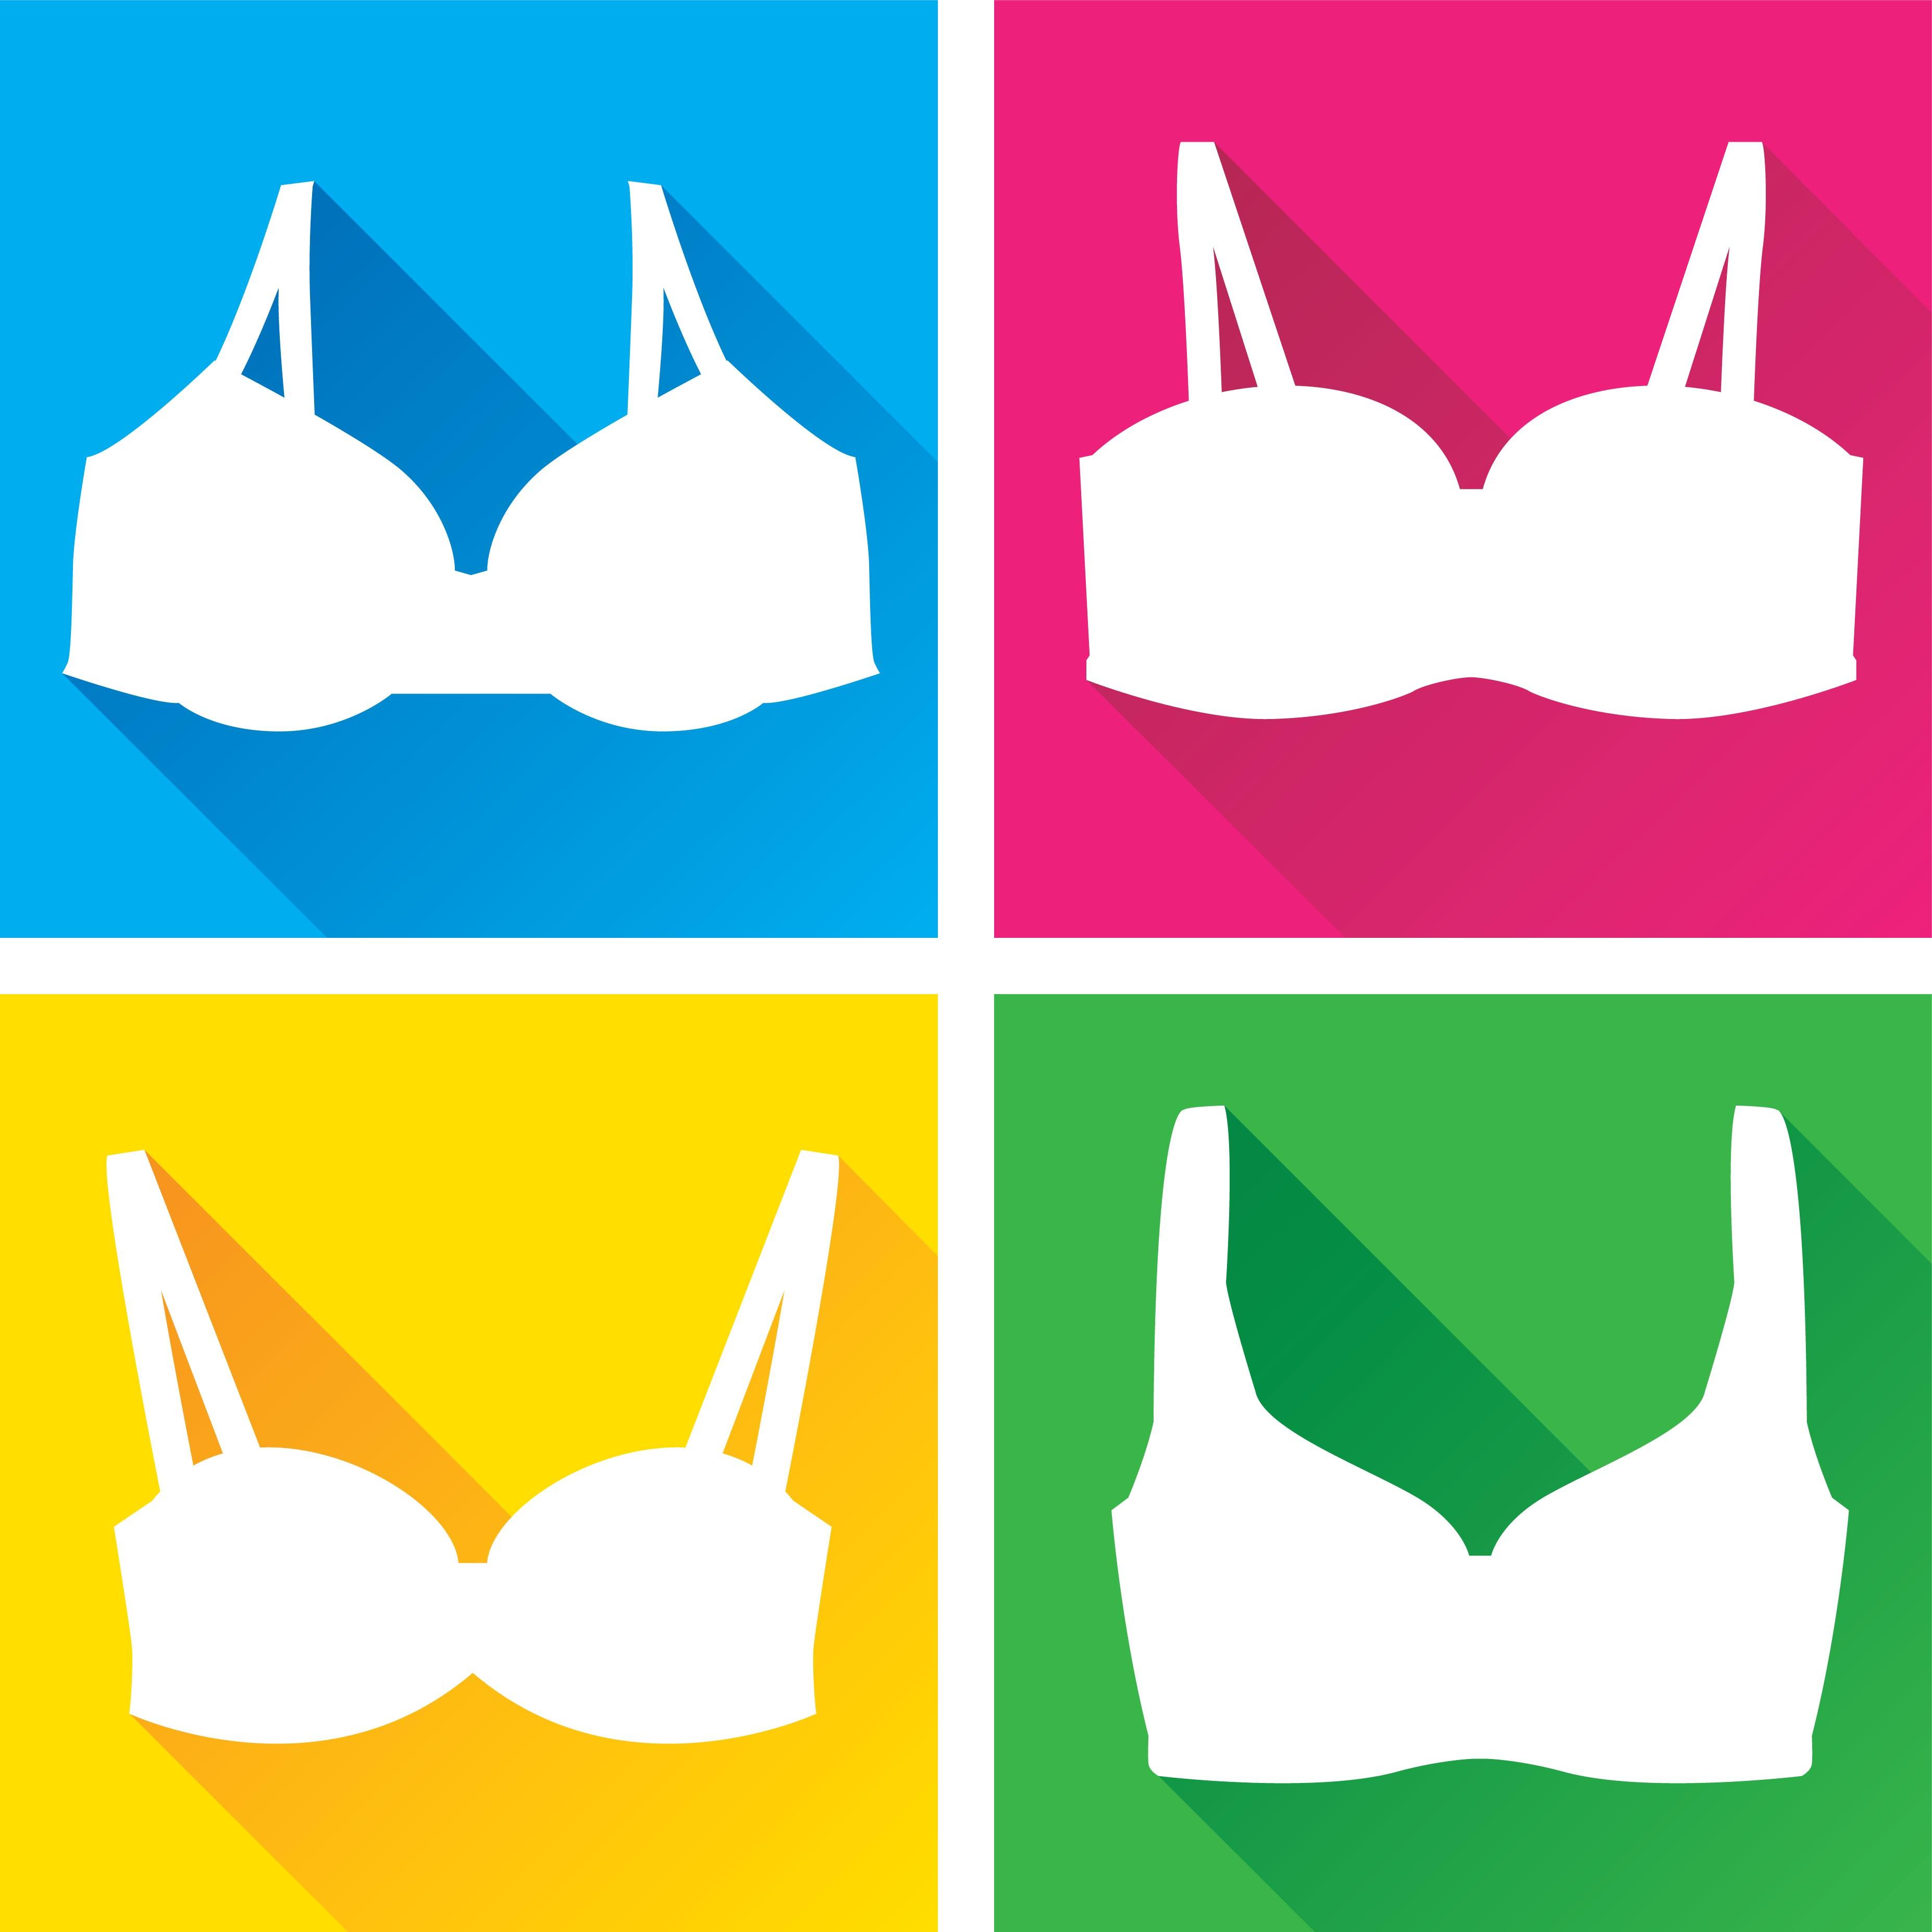 Bra clipart sports bra. Find your perfect